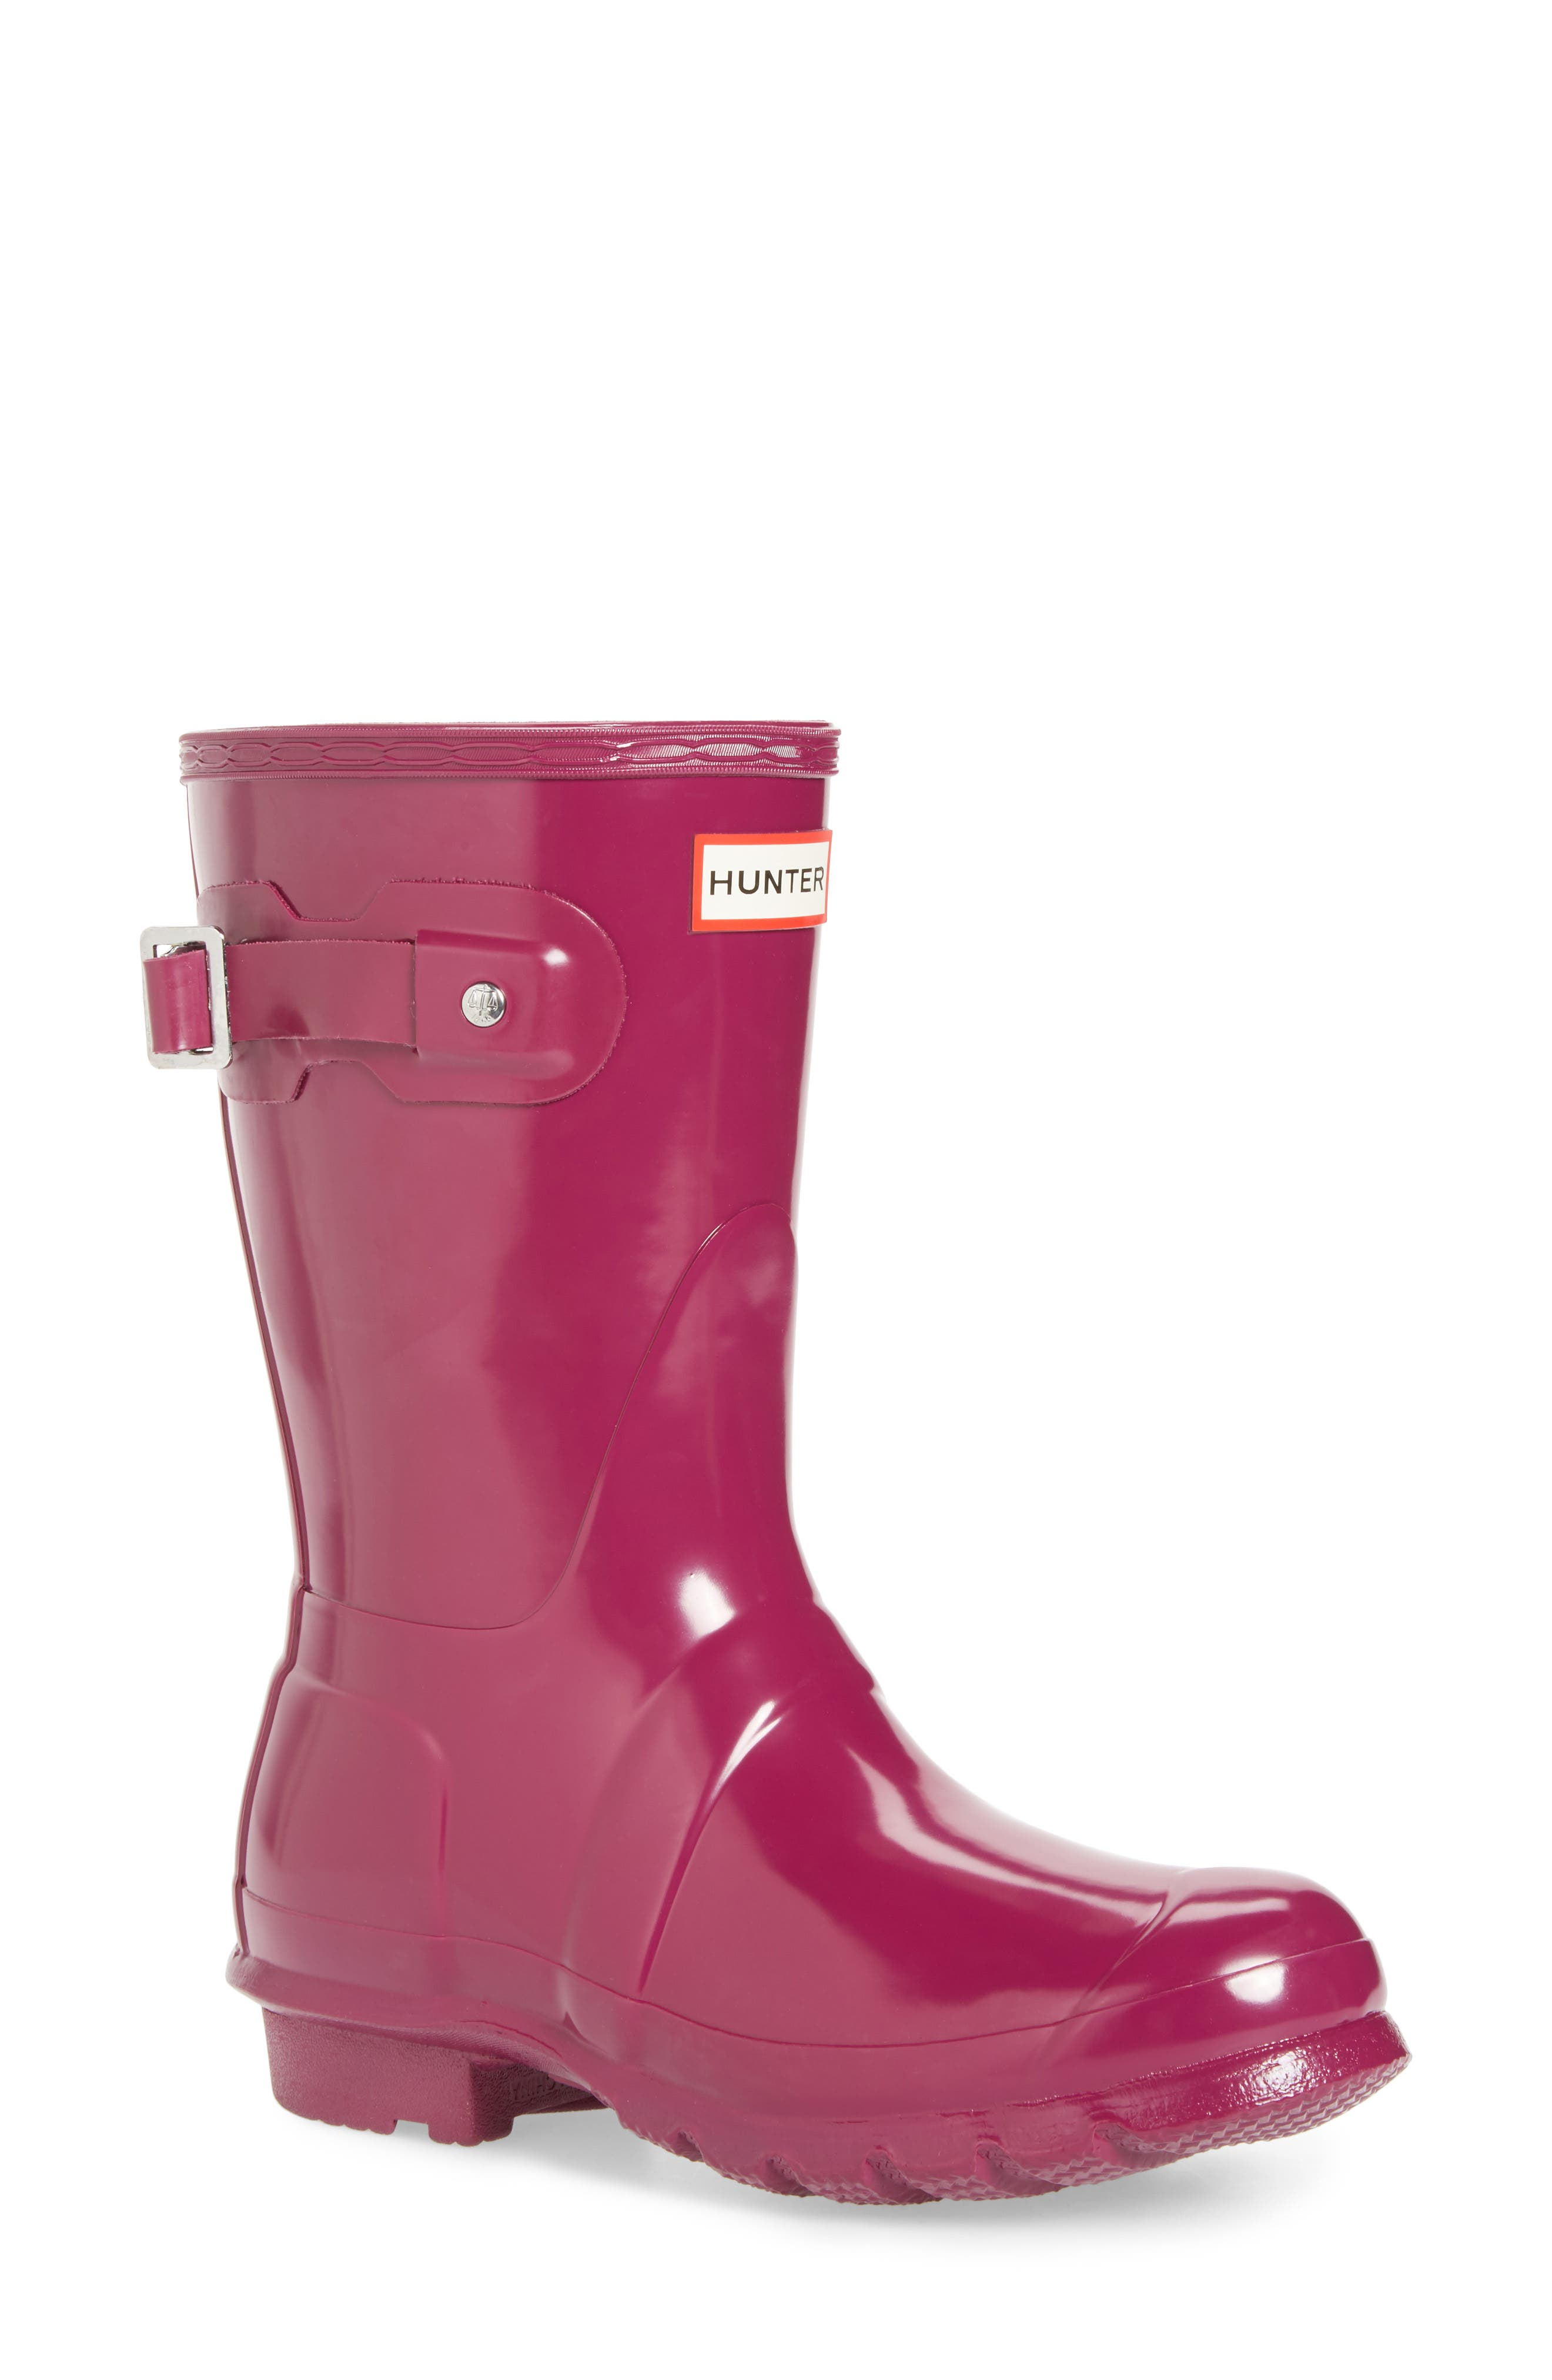 Women's Lightweight Flat Sole Pull On Short Boots